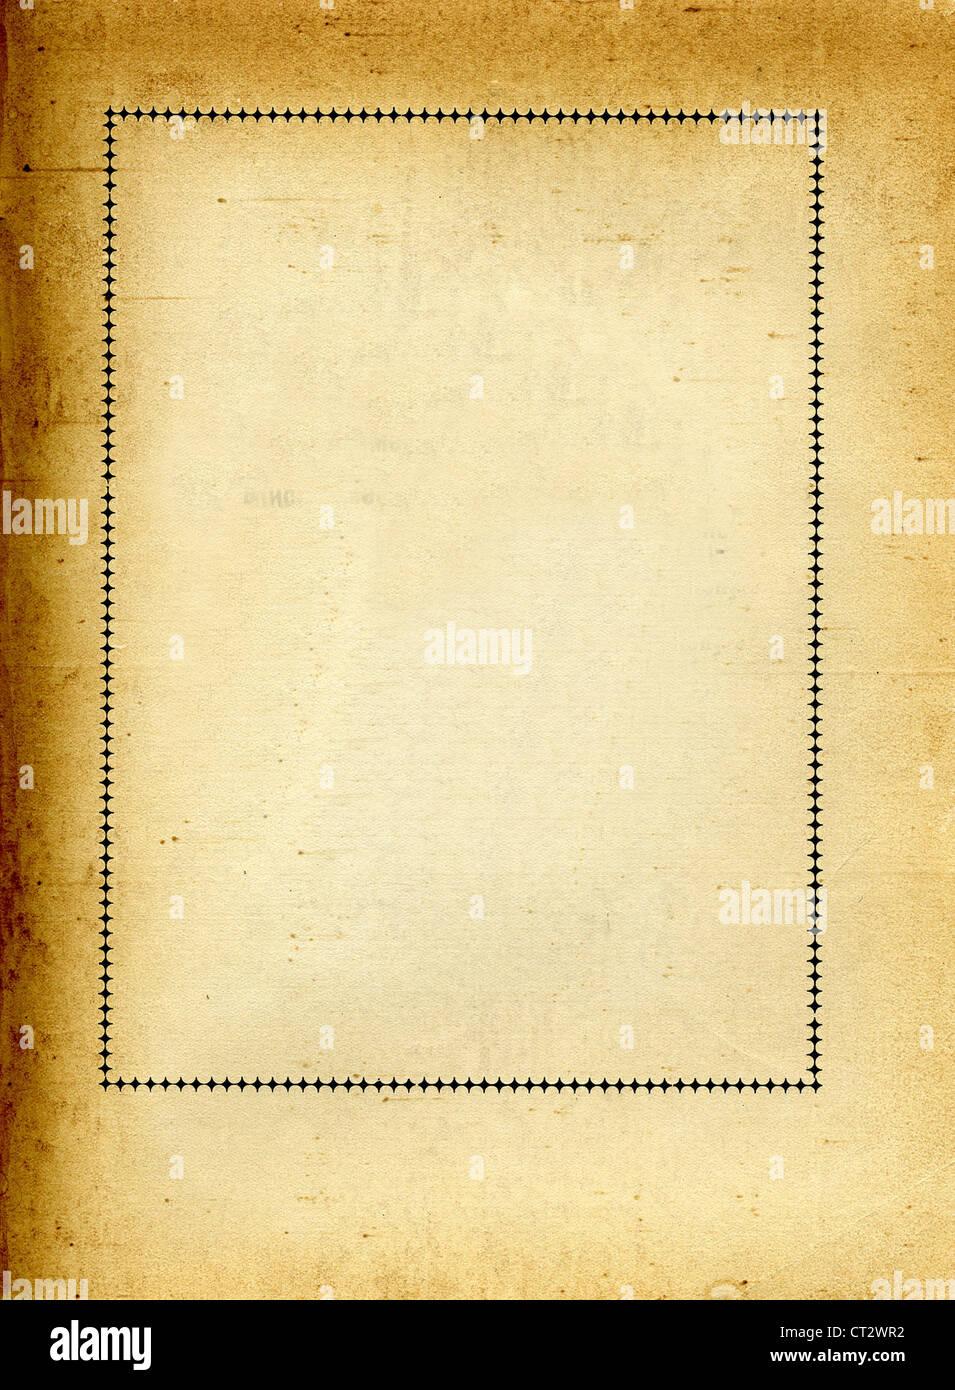 Rahmen auf altes Papier Stockfoto, Bild: 49236630 - Alamy